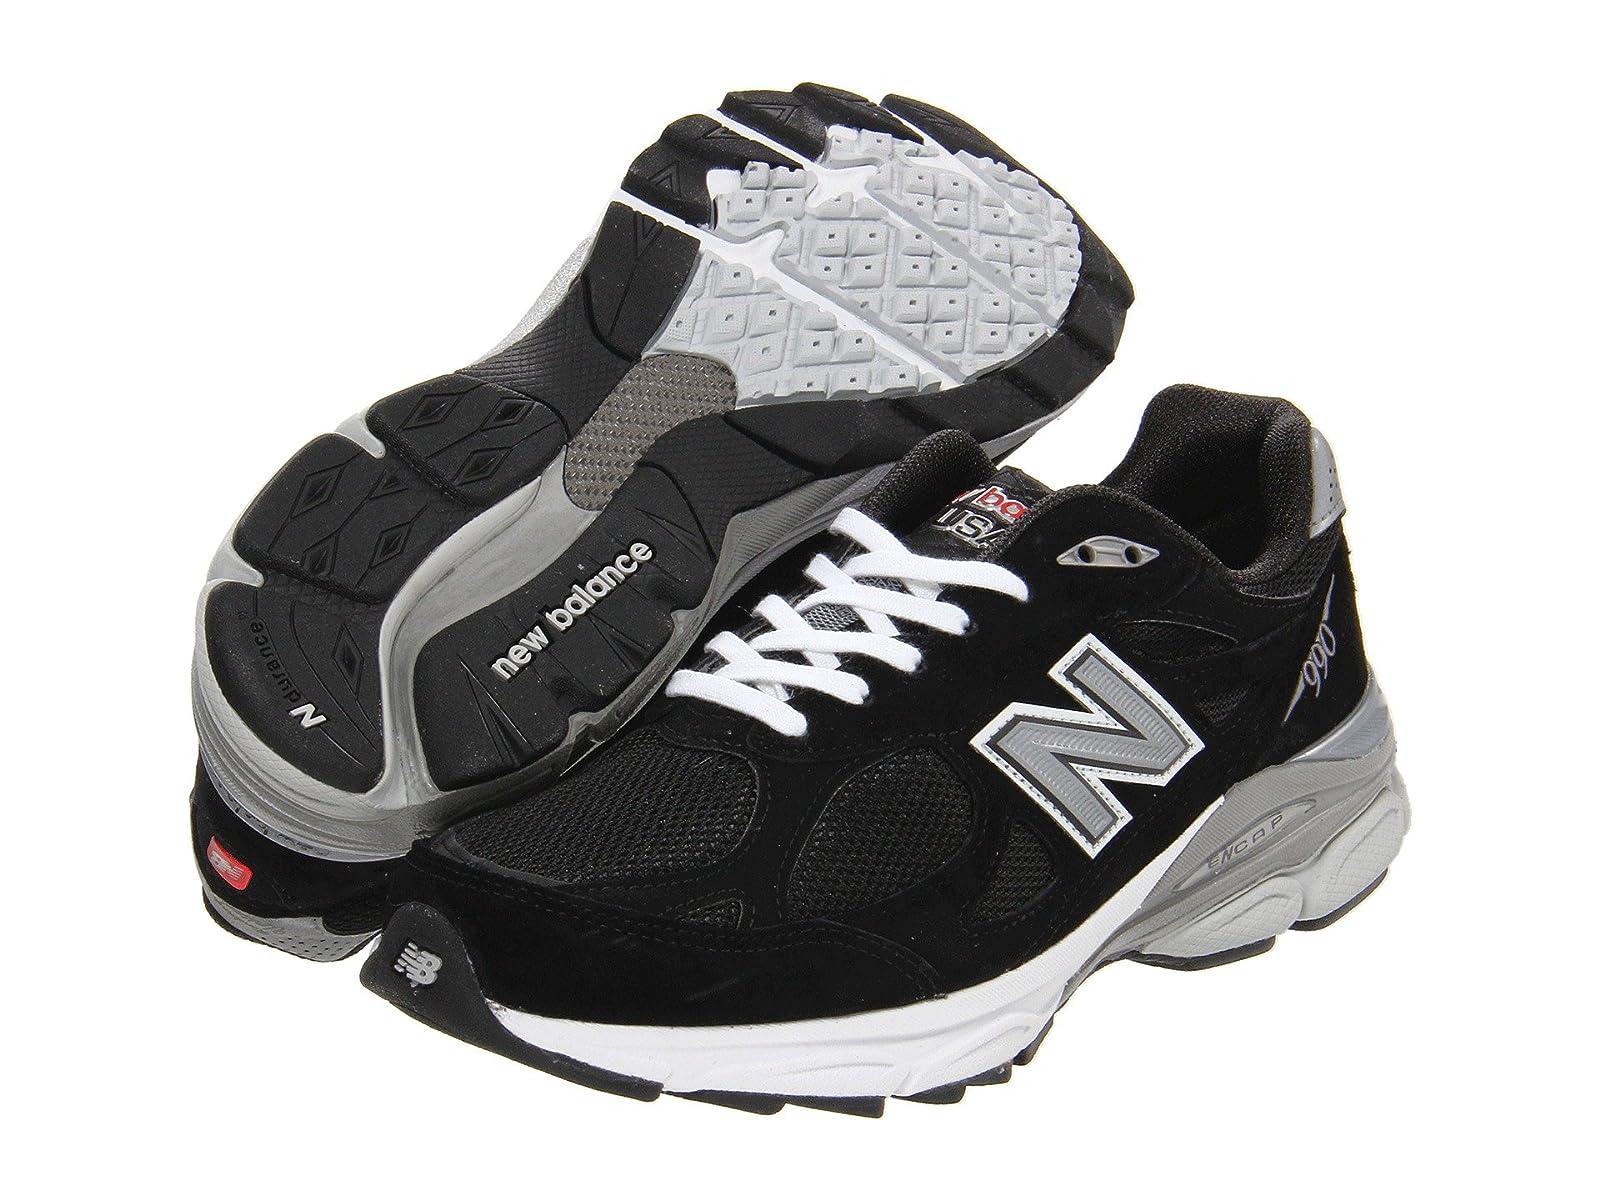 New Balance W990v3Atmospheric grades have affordable shoes